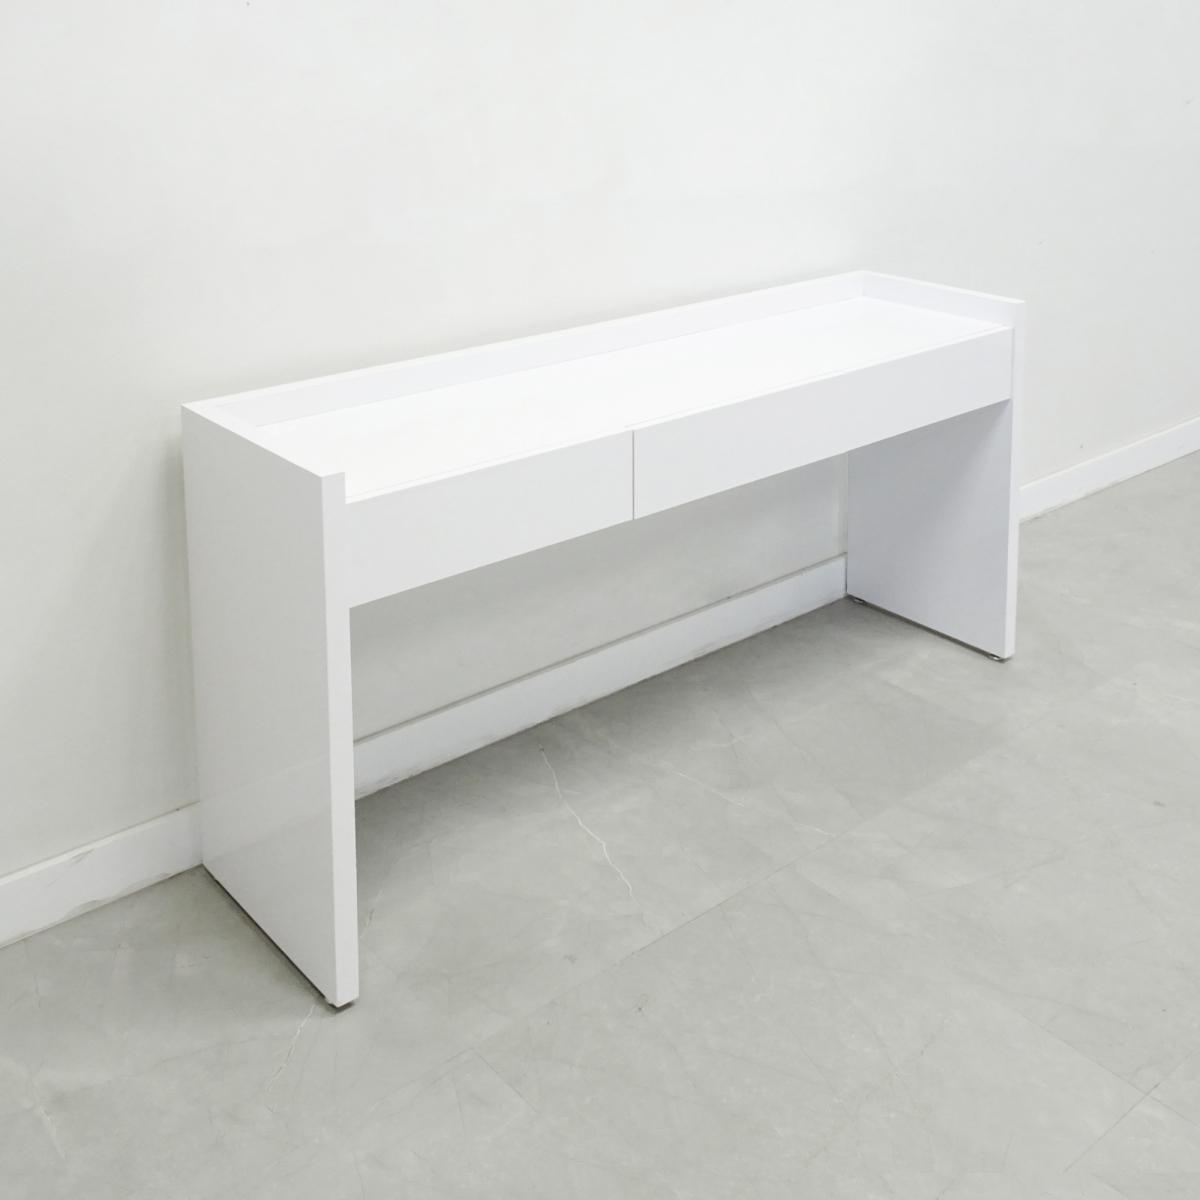 Aspen Console Server Table - In White Gloss Laminate